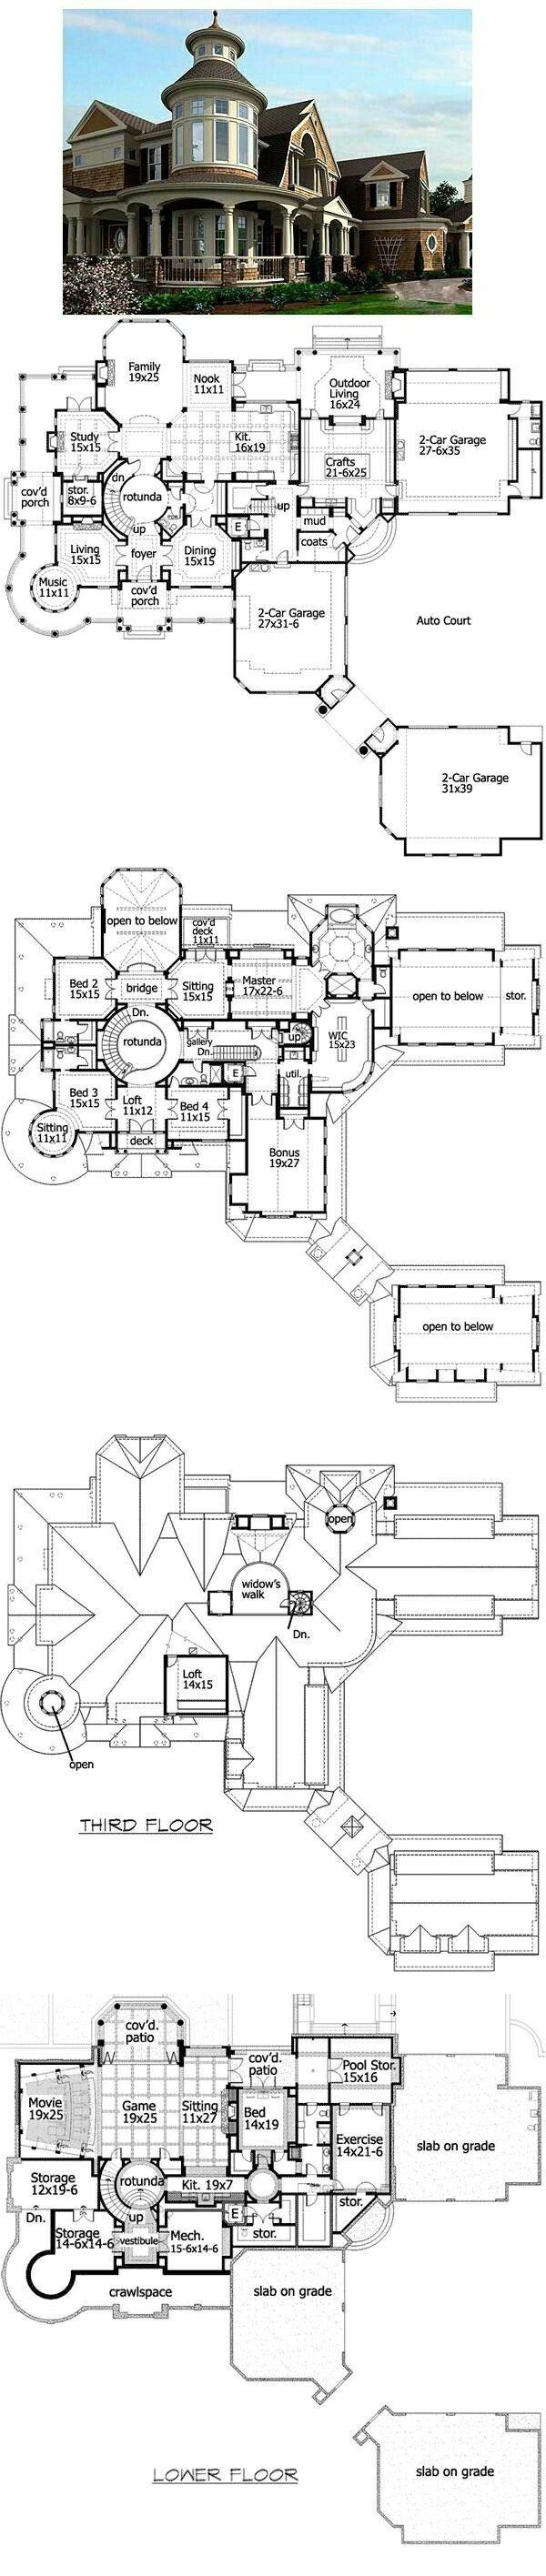 Victorian Dream Home House Floor Plans House Layouts House Blueprints